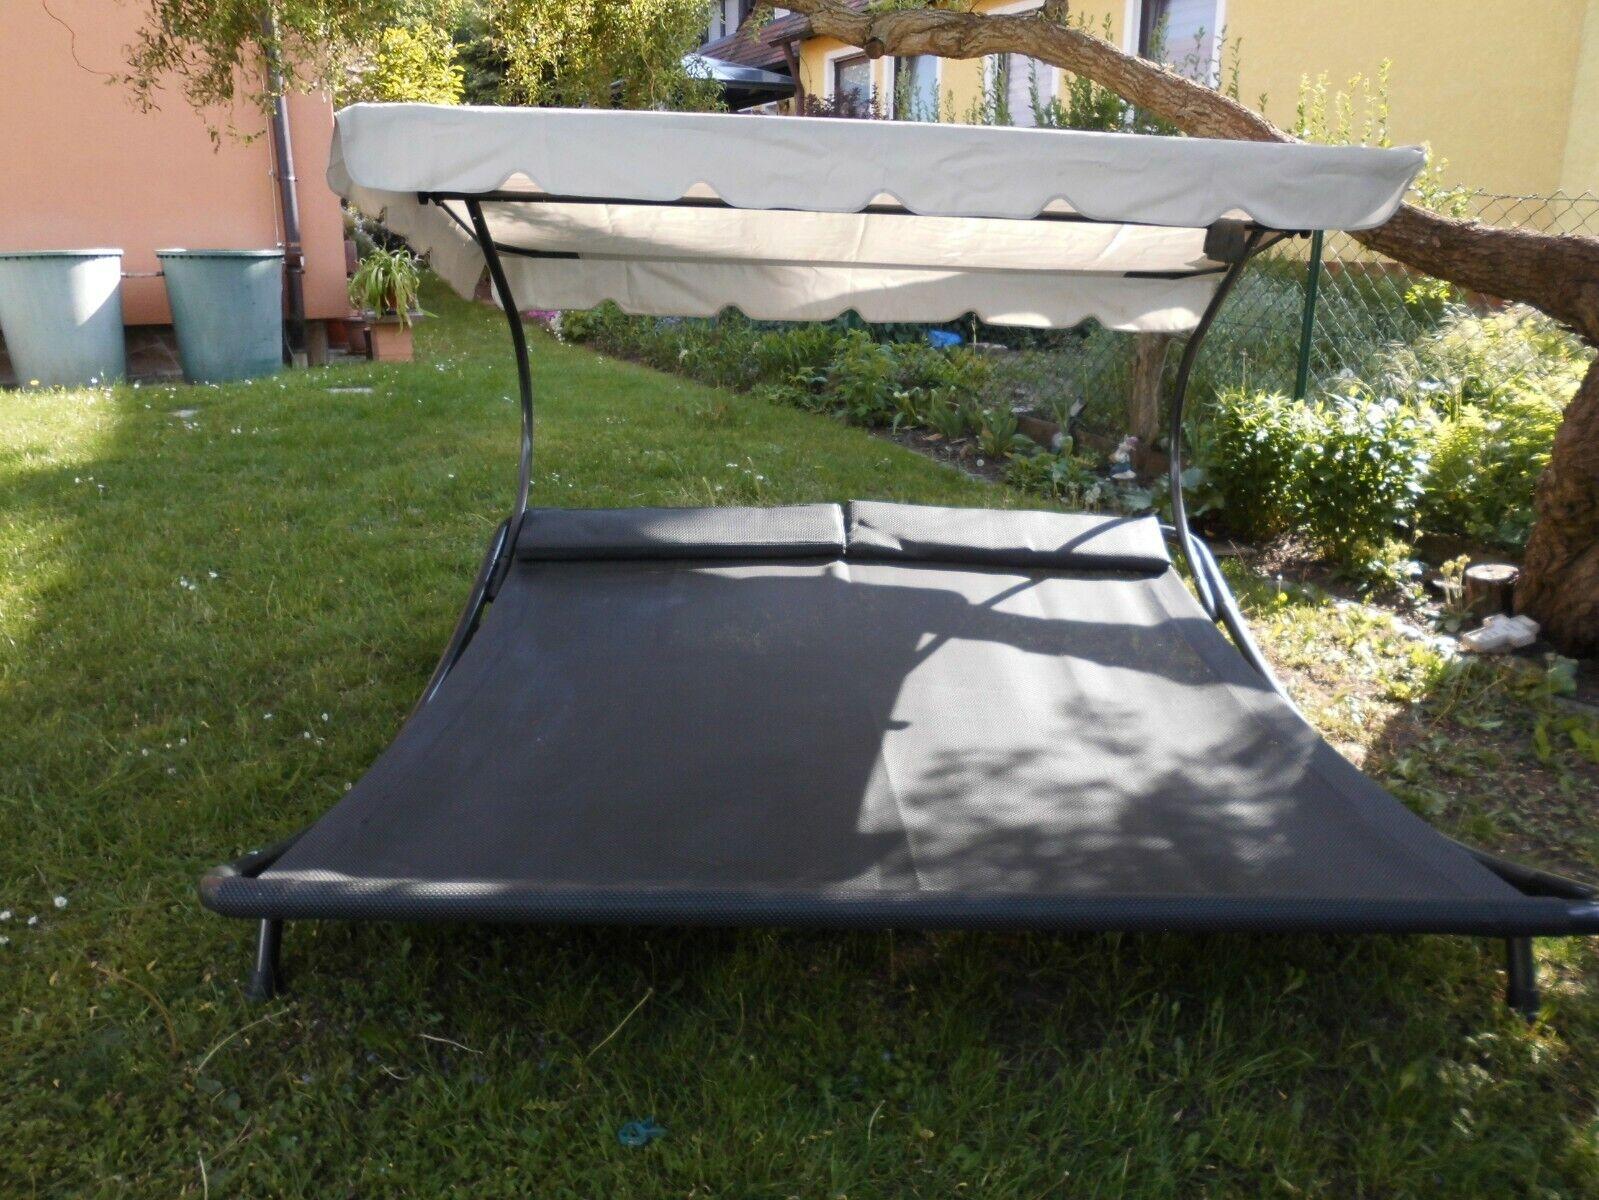 Doppelliege ,Double Bed,200/190,LECO,incl Dach,grau hochwertig,Gartenmöbel